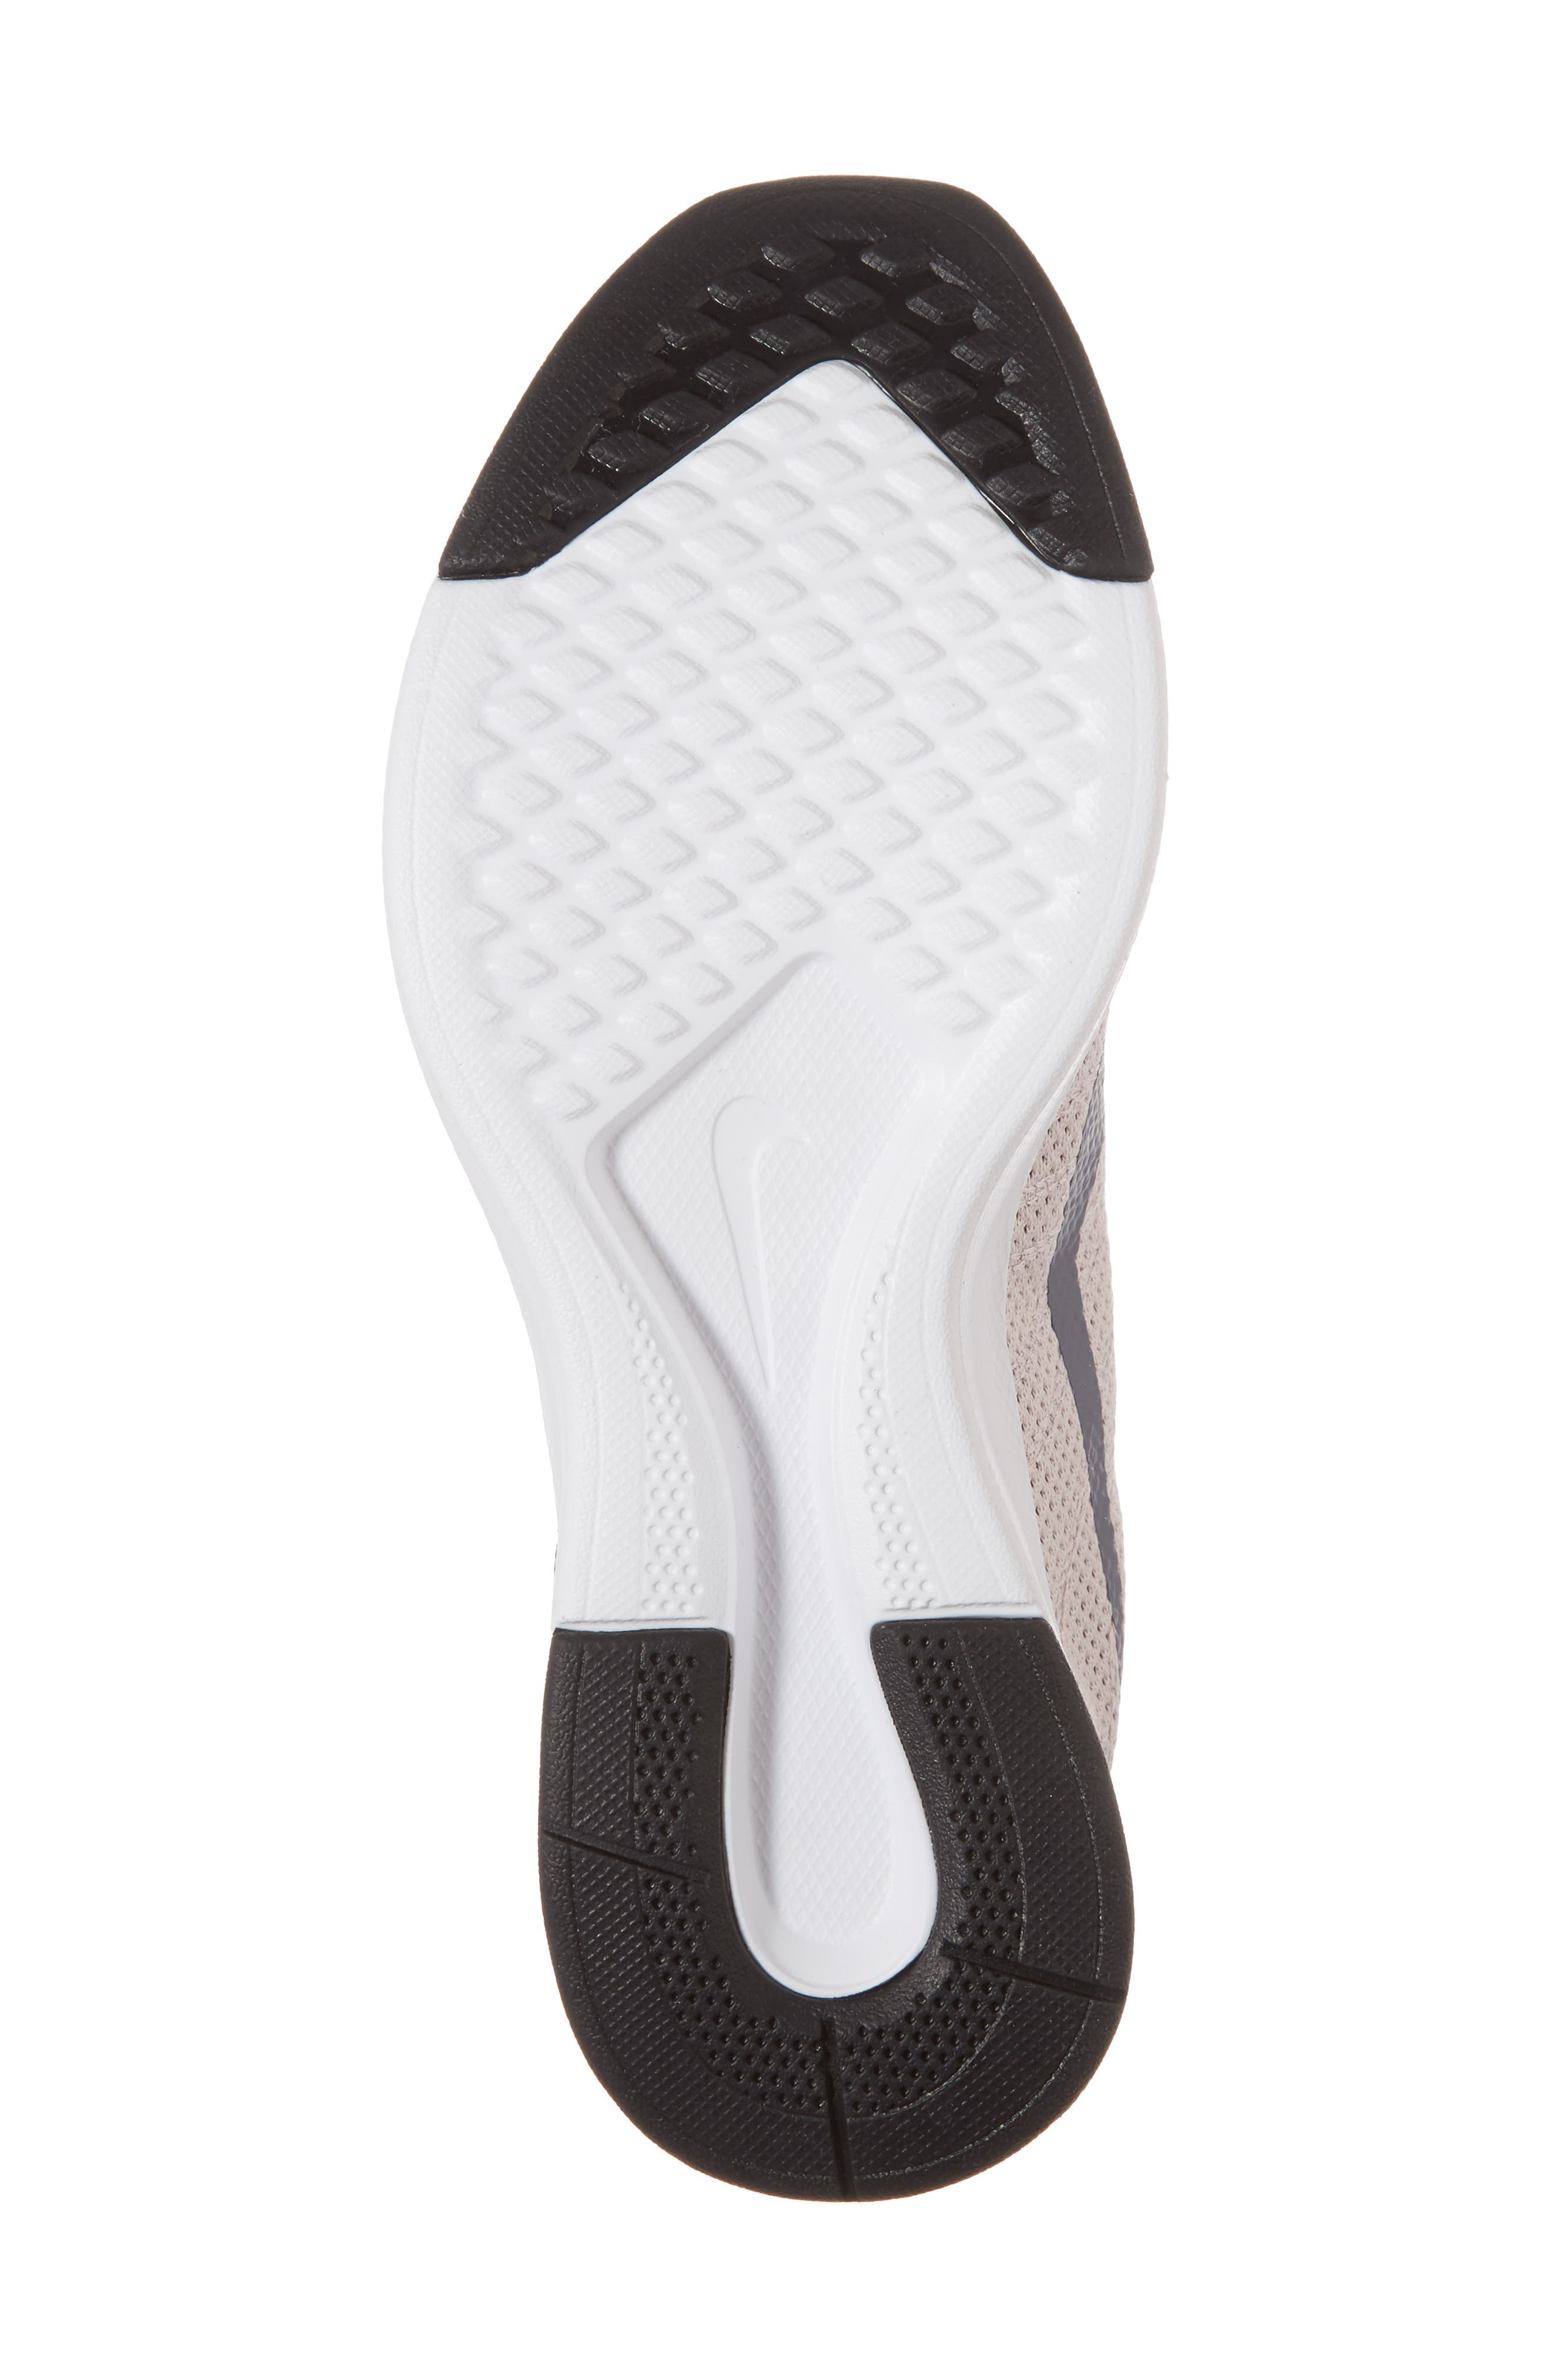 Dualtone Racer GS Sneaker,                             Alternate thumbnail 6, color,                             020